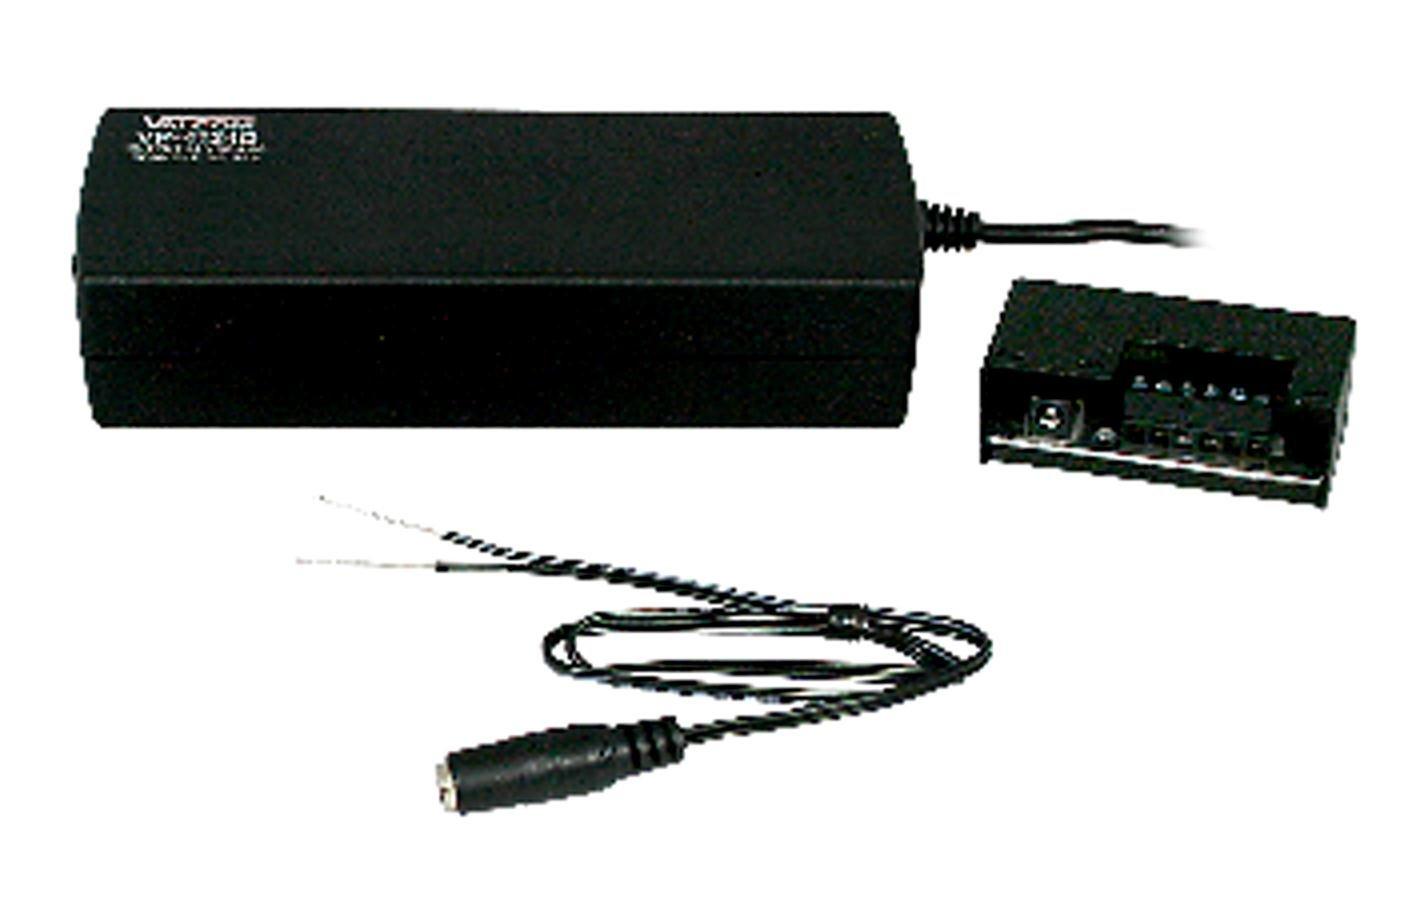 VALCOM VC-VP-4124D Wall, Rack or Wall Mnt 4 amp Power Suppl White Box by Valcom